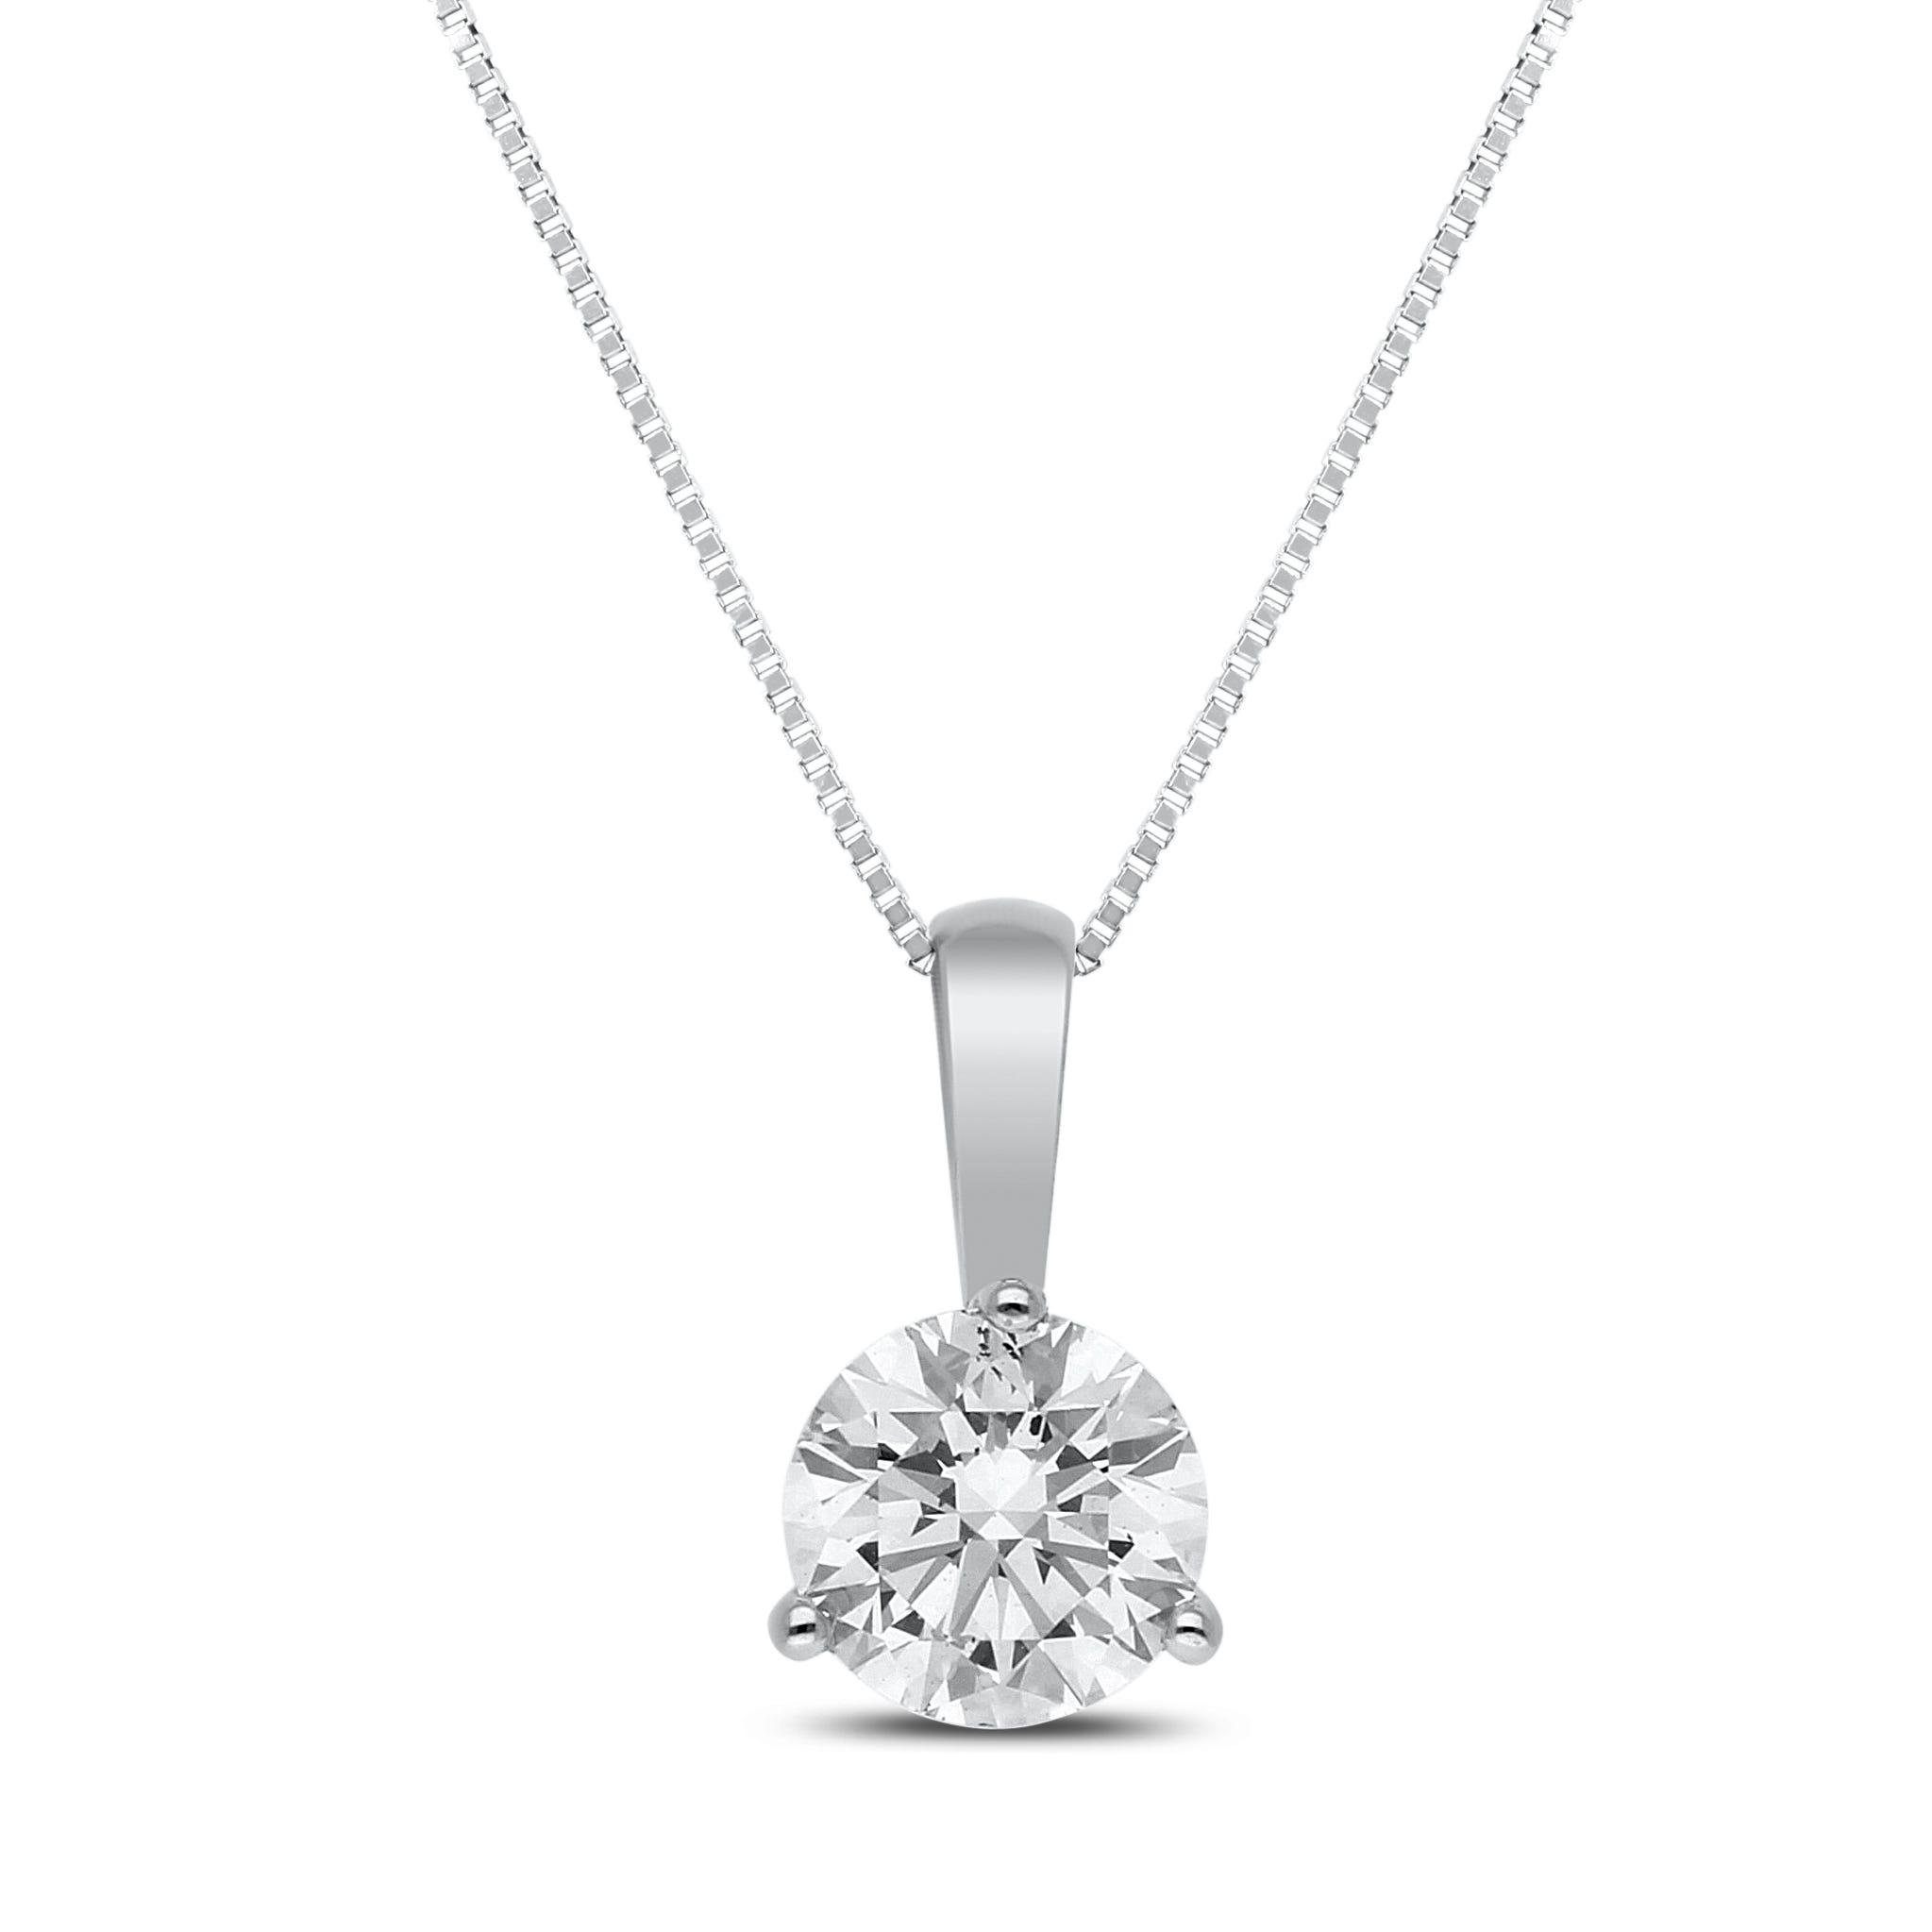 Lab-Crafted Diamond 7/8ctw. Brilliant Round Diamond Pendant in 14k White Gold